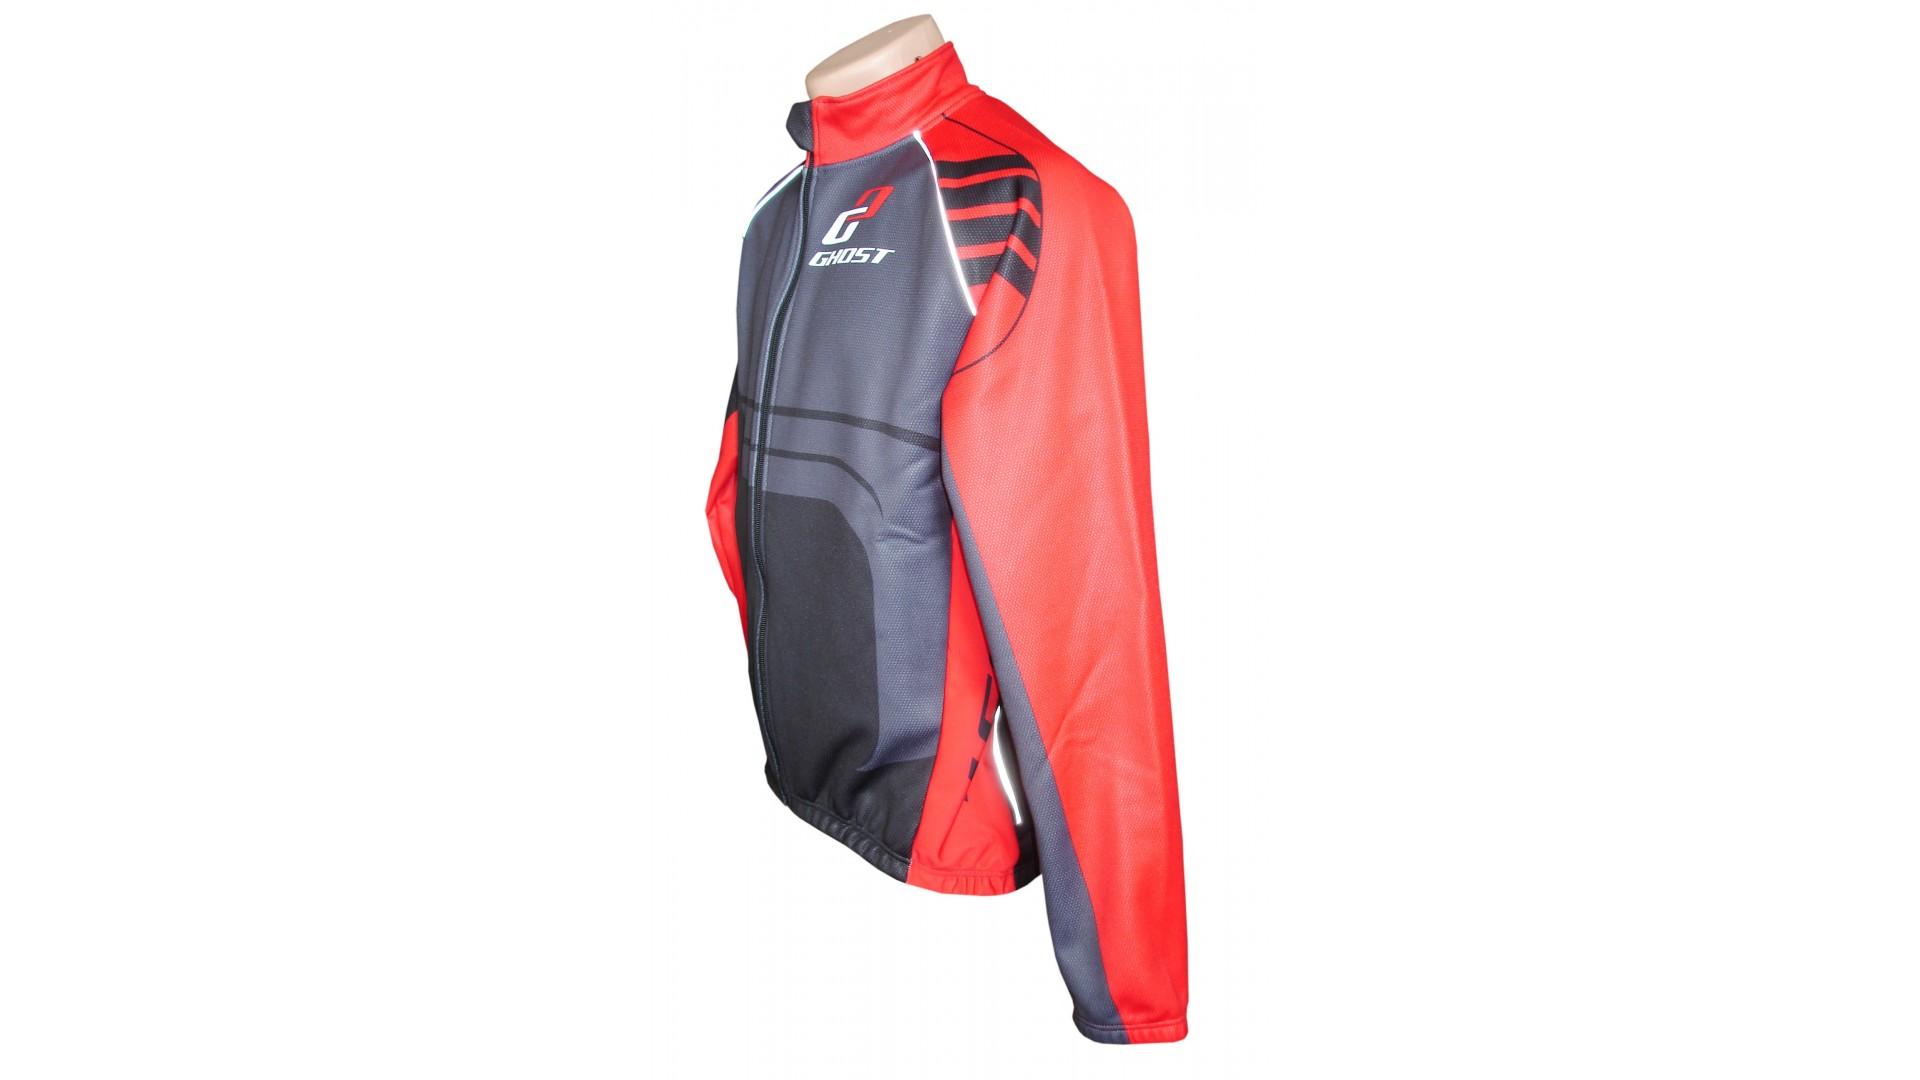 Велокуртка Ghost Winter jacket black/red демисезонная год 2014 вид сбоку